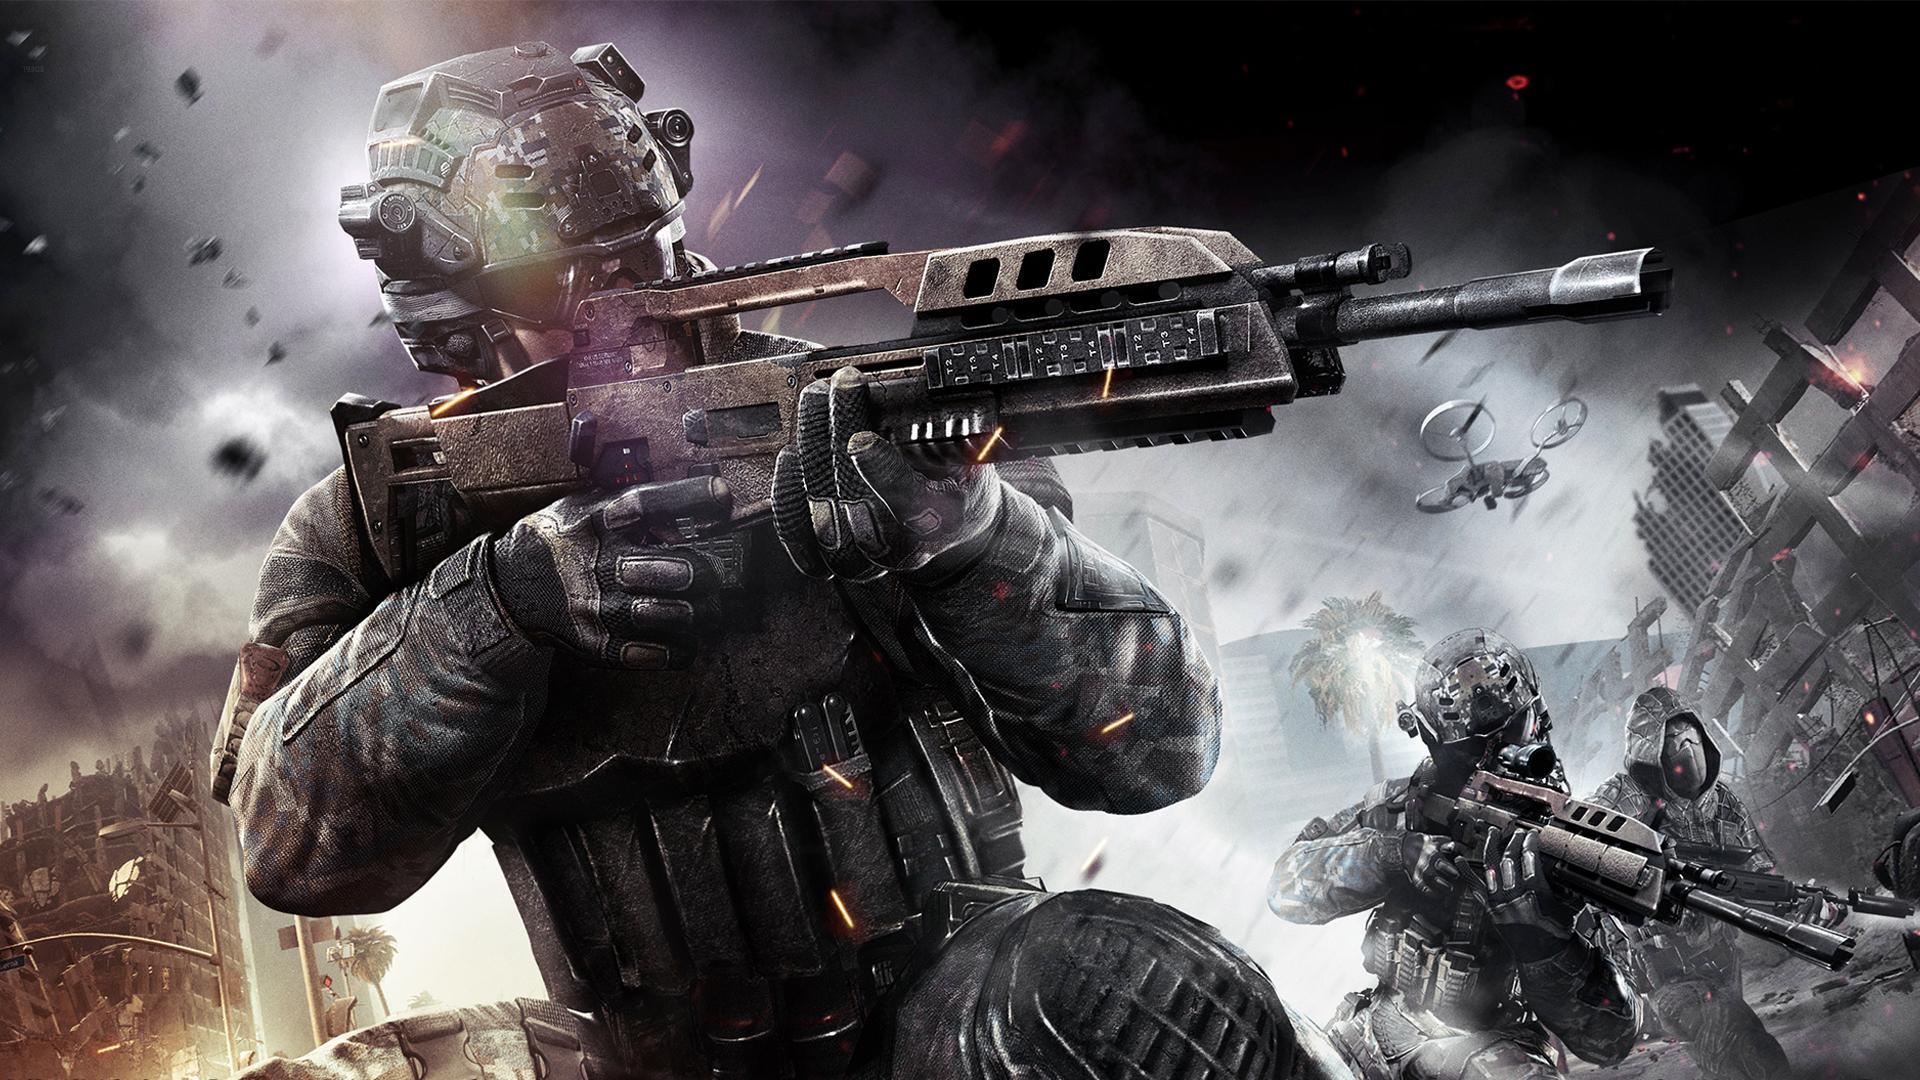 Black Ops 2 Video Game wallpaper 1920x1080 1080p hd wallpaper download 1920x1080